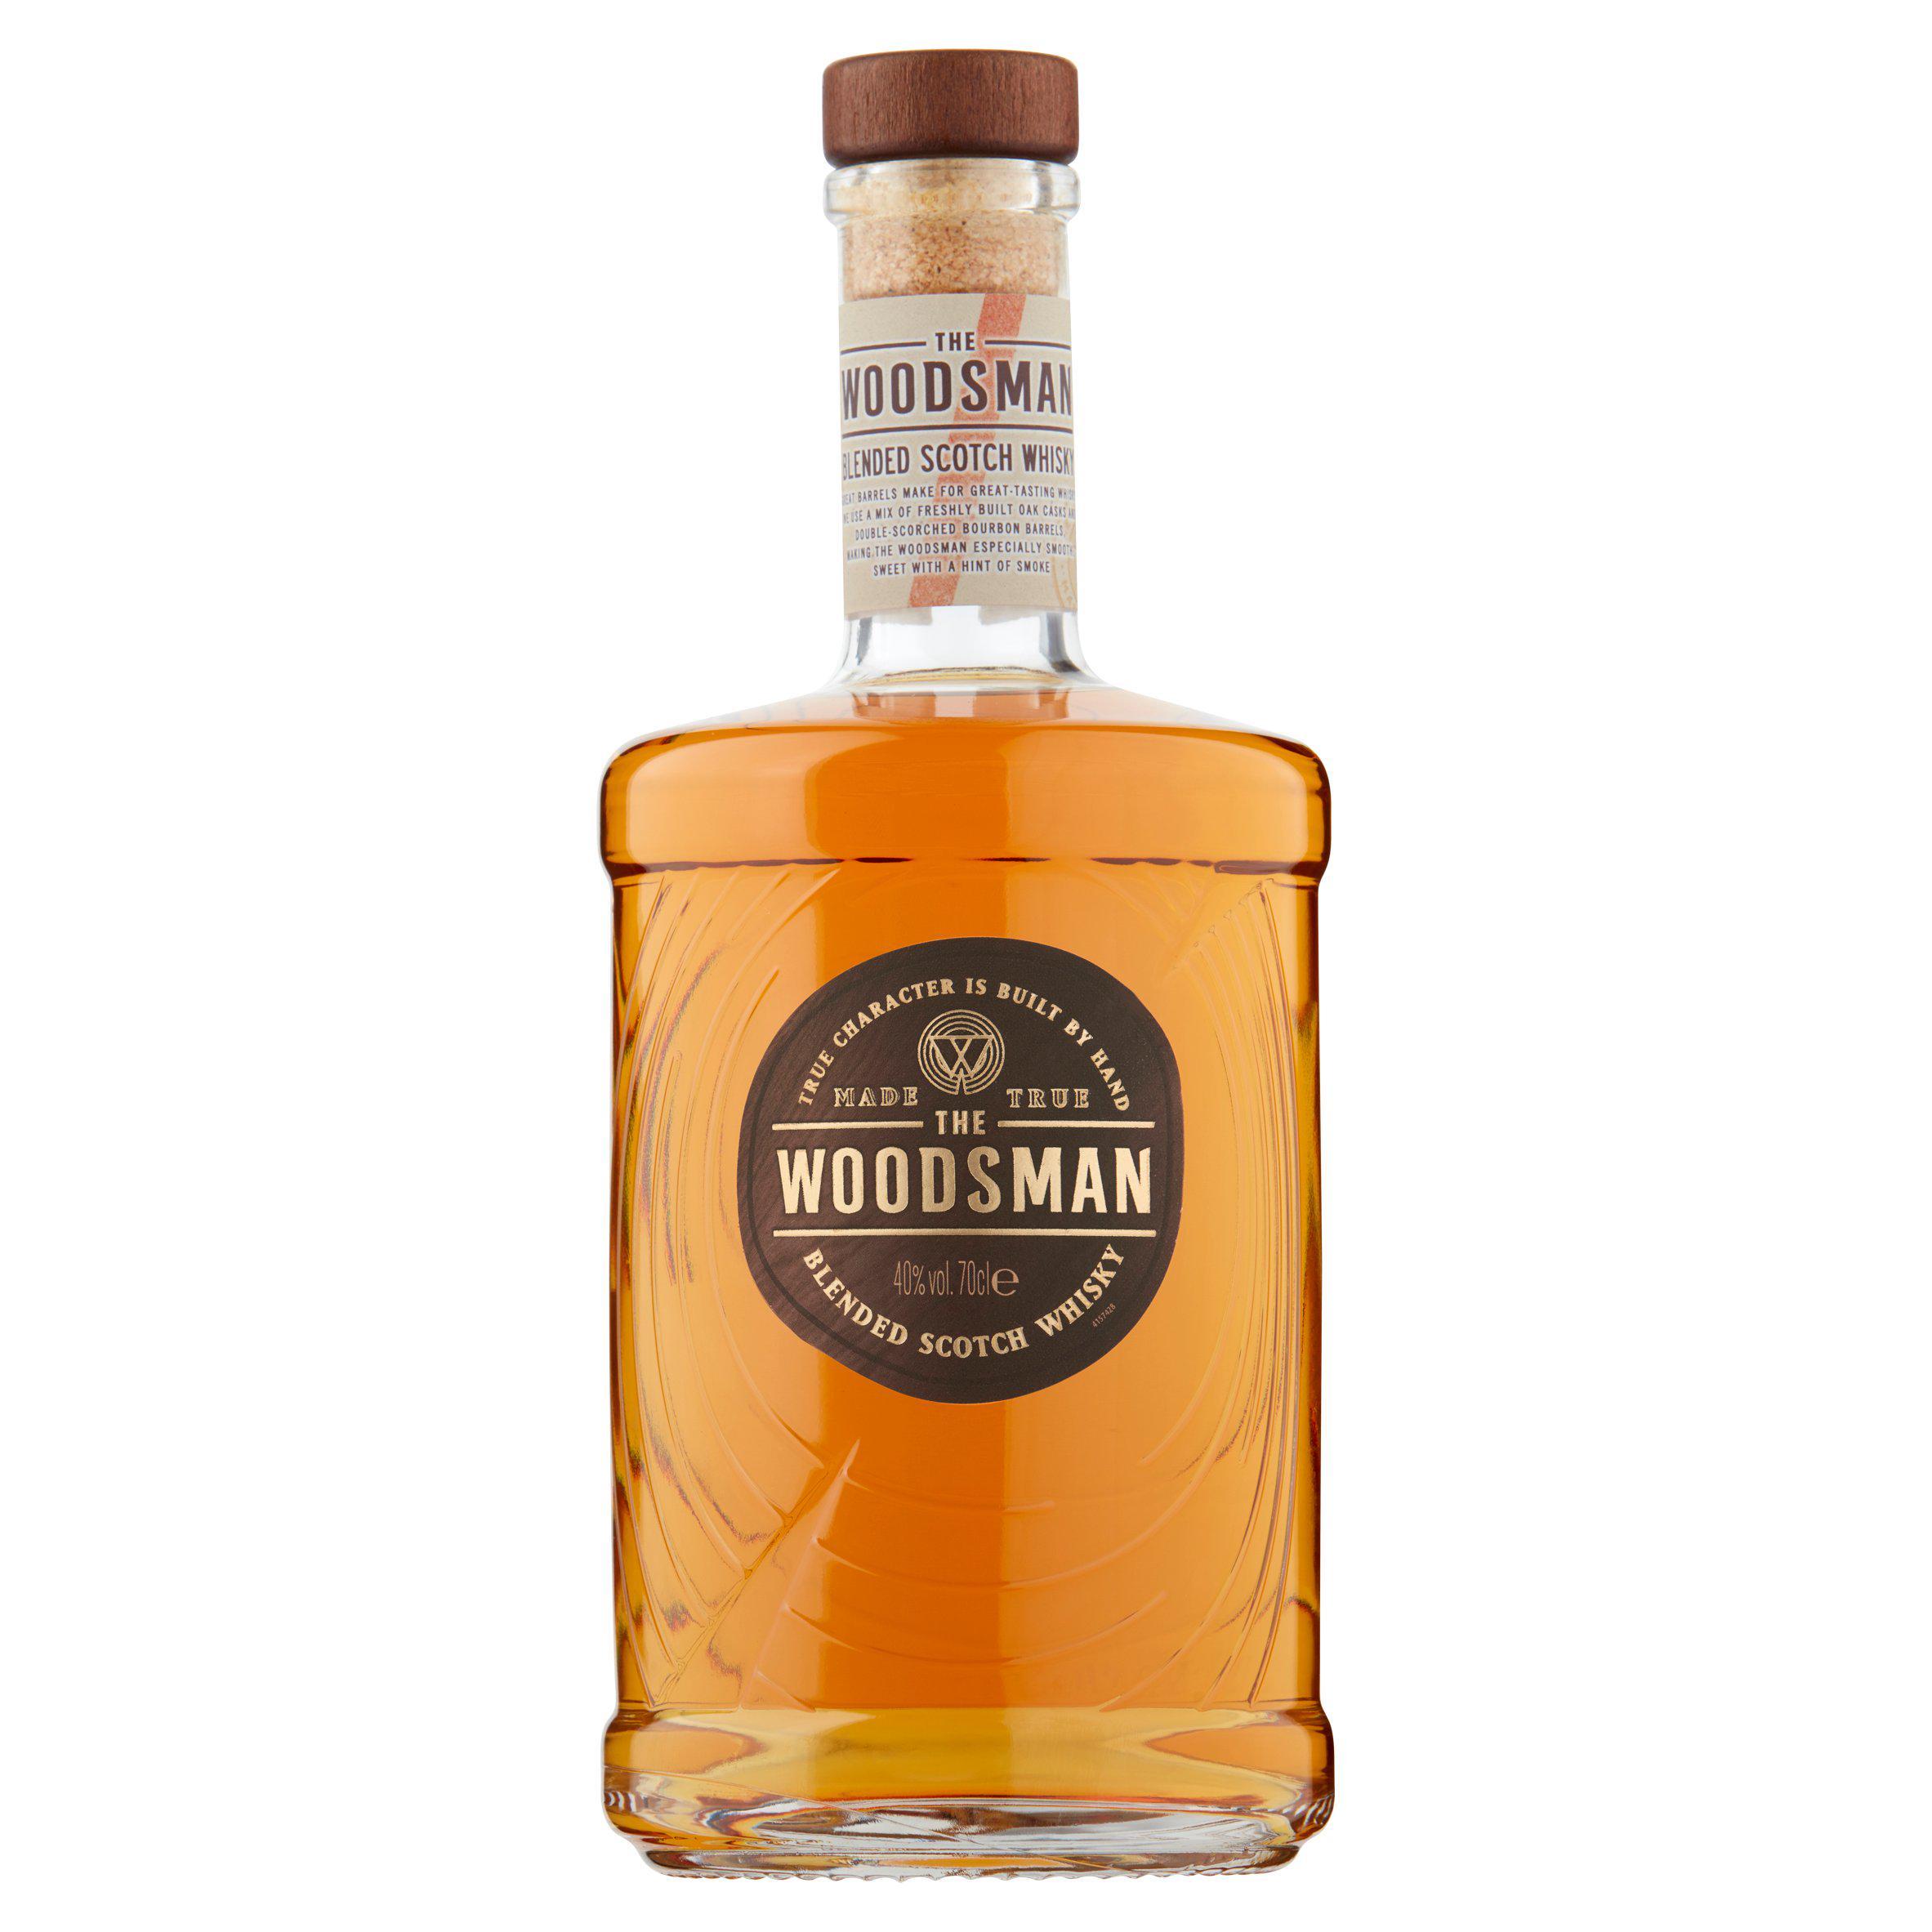 The Woodsman Blended Scotch Whisky 70cl (40% vol) £18 at Asda